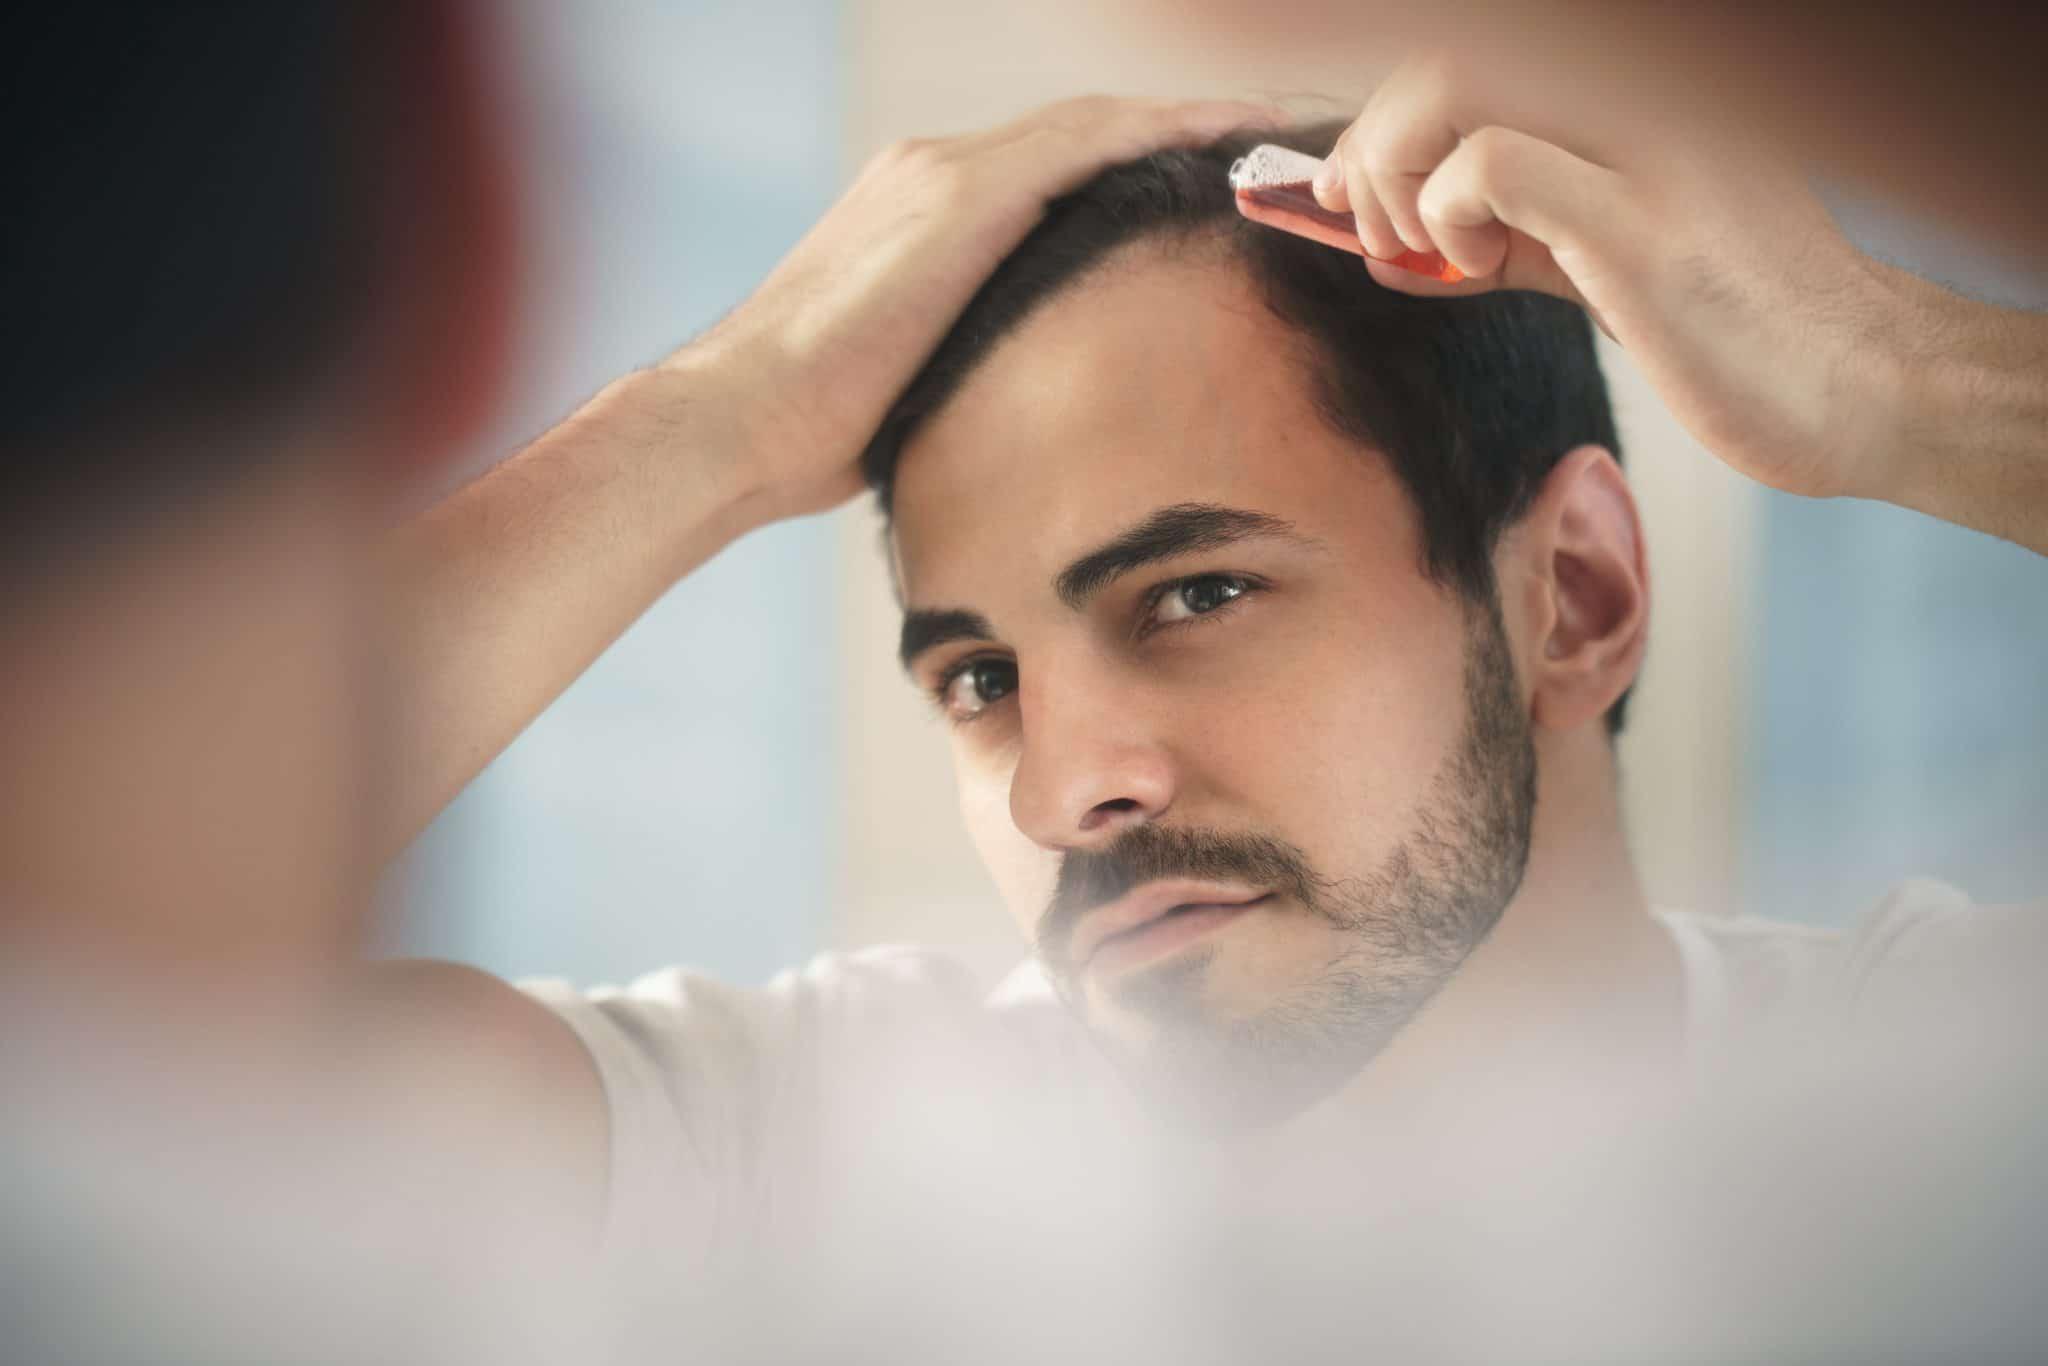 Photo of تساقط الشعر الاسباب وطرق العلاج الطبيعية